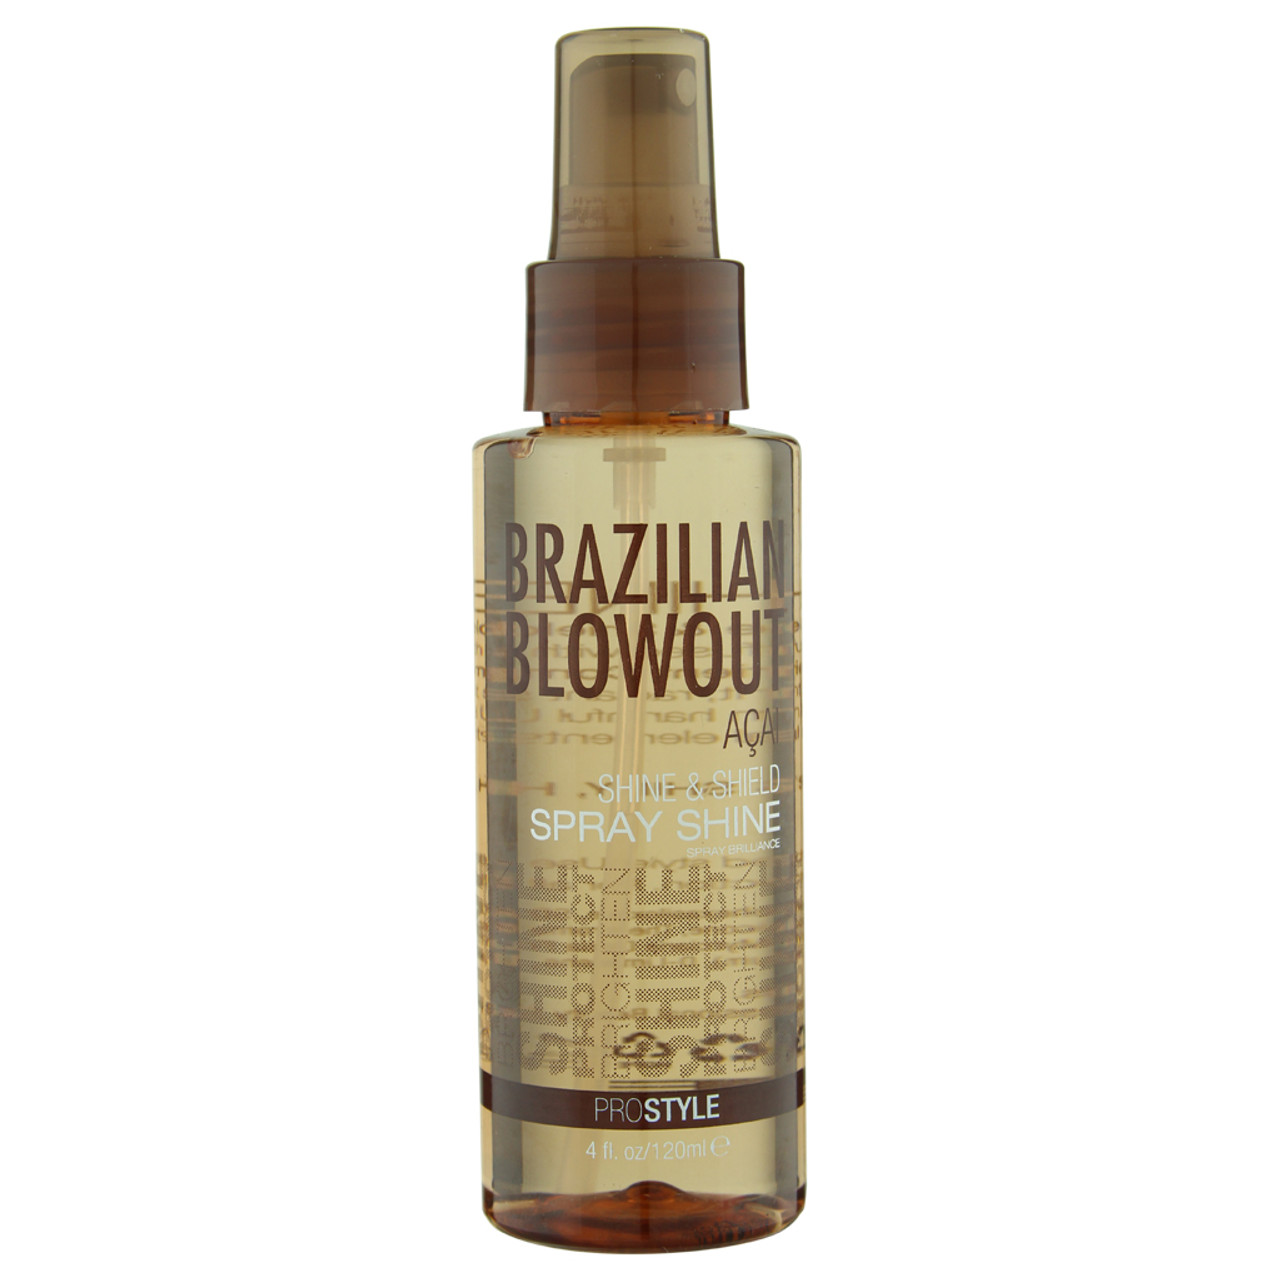 Brazilian Blowout Shine and Shield Spray Shine 4 oz